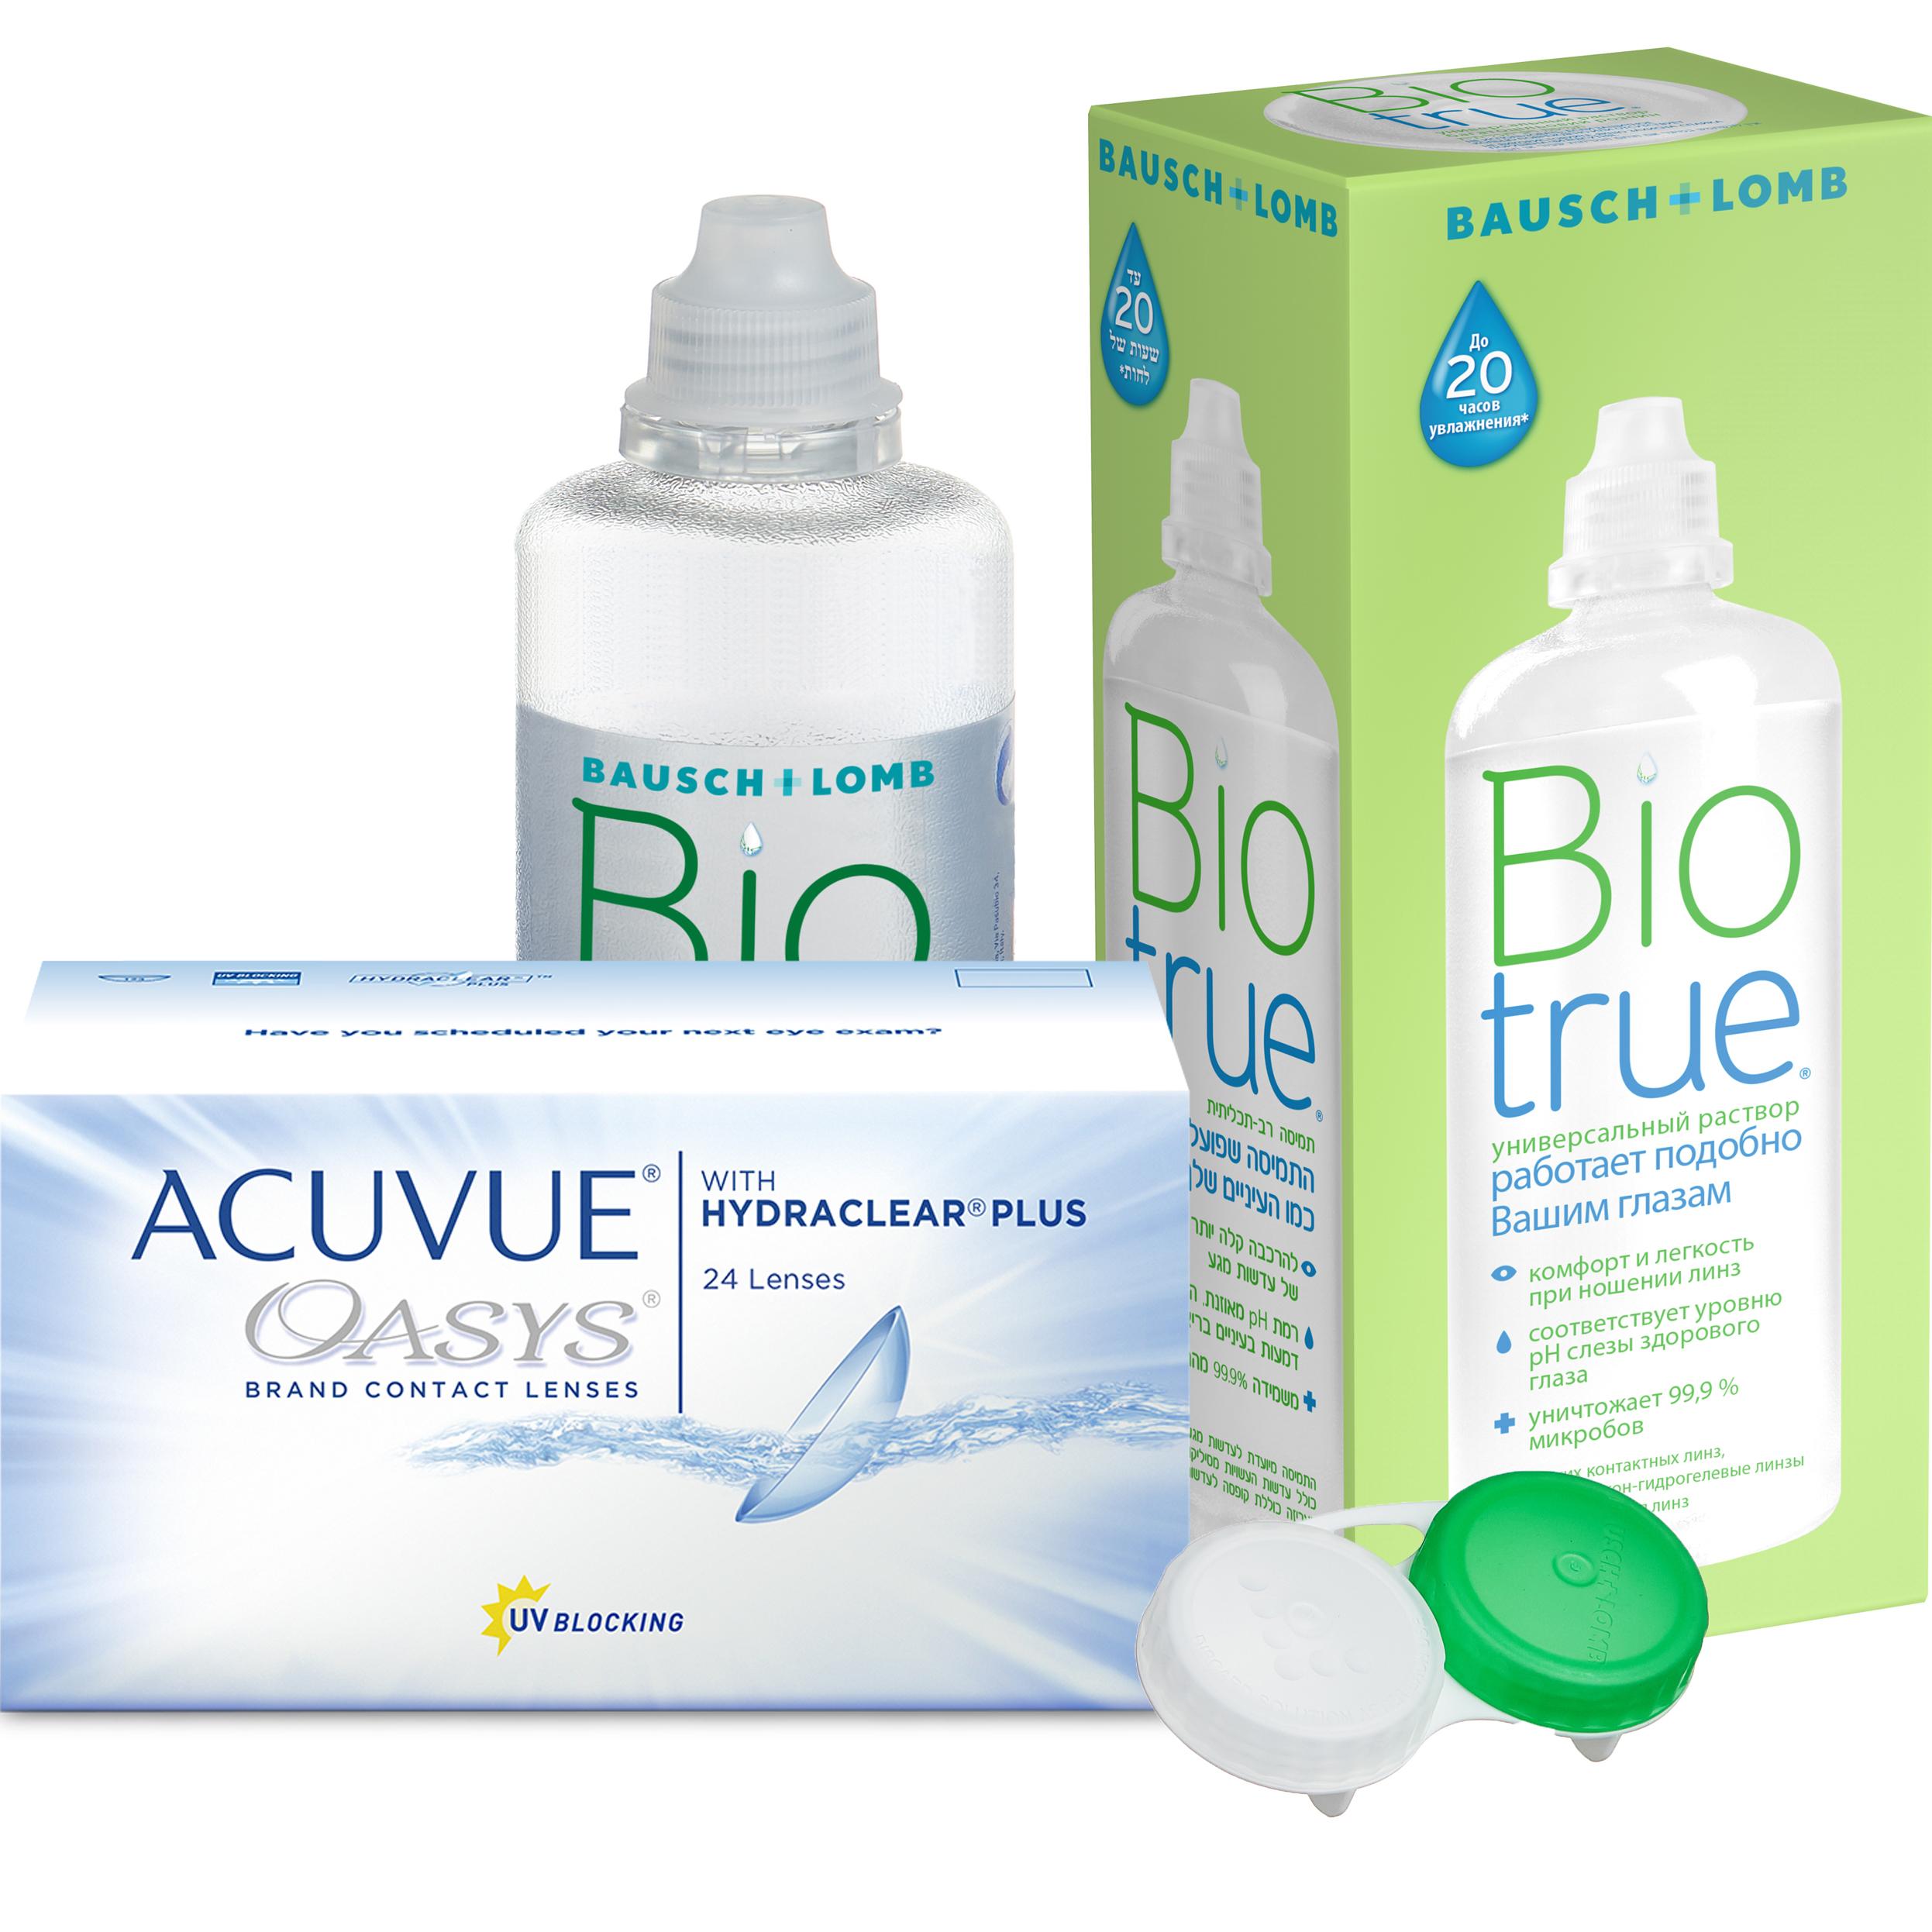 Купить Oasys with Hydraclear Plus 24 линзы + Biotrue, Контактные линзы Acuvue Oasys with Hydraclear Plus 24 линзы R 8.8 +6, 50 + Biotrue 300 мл